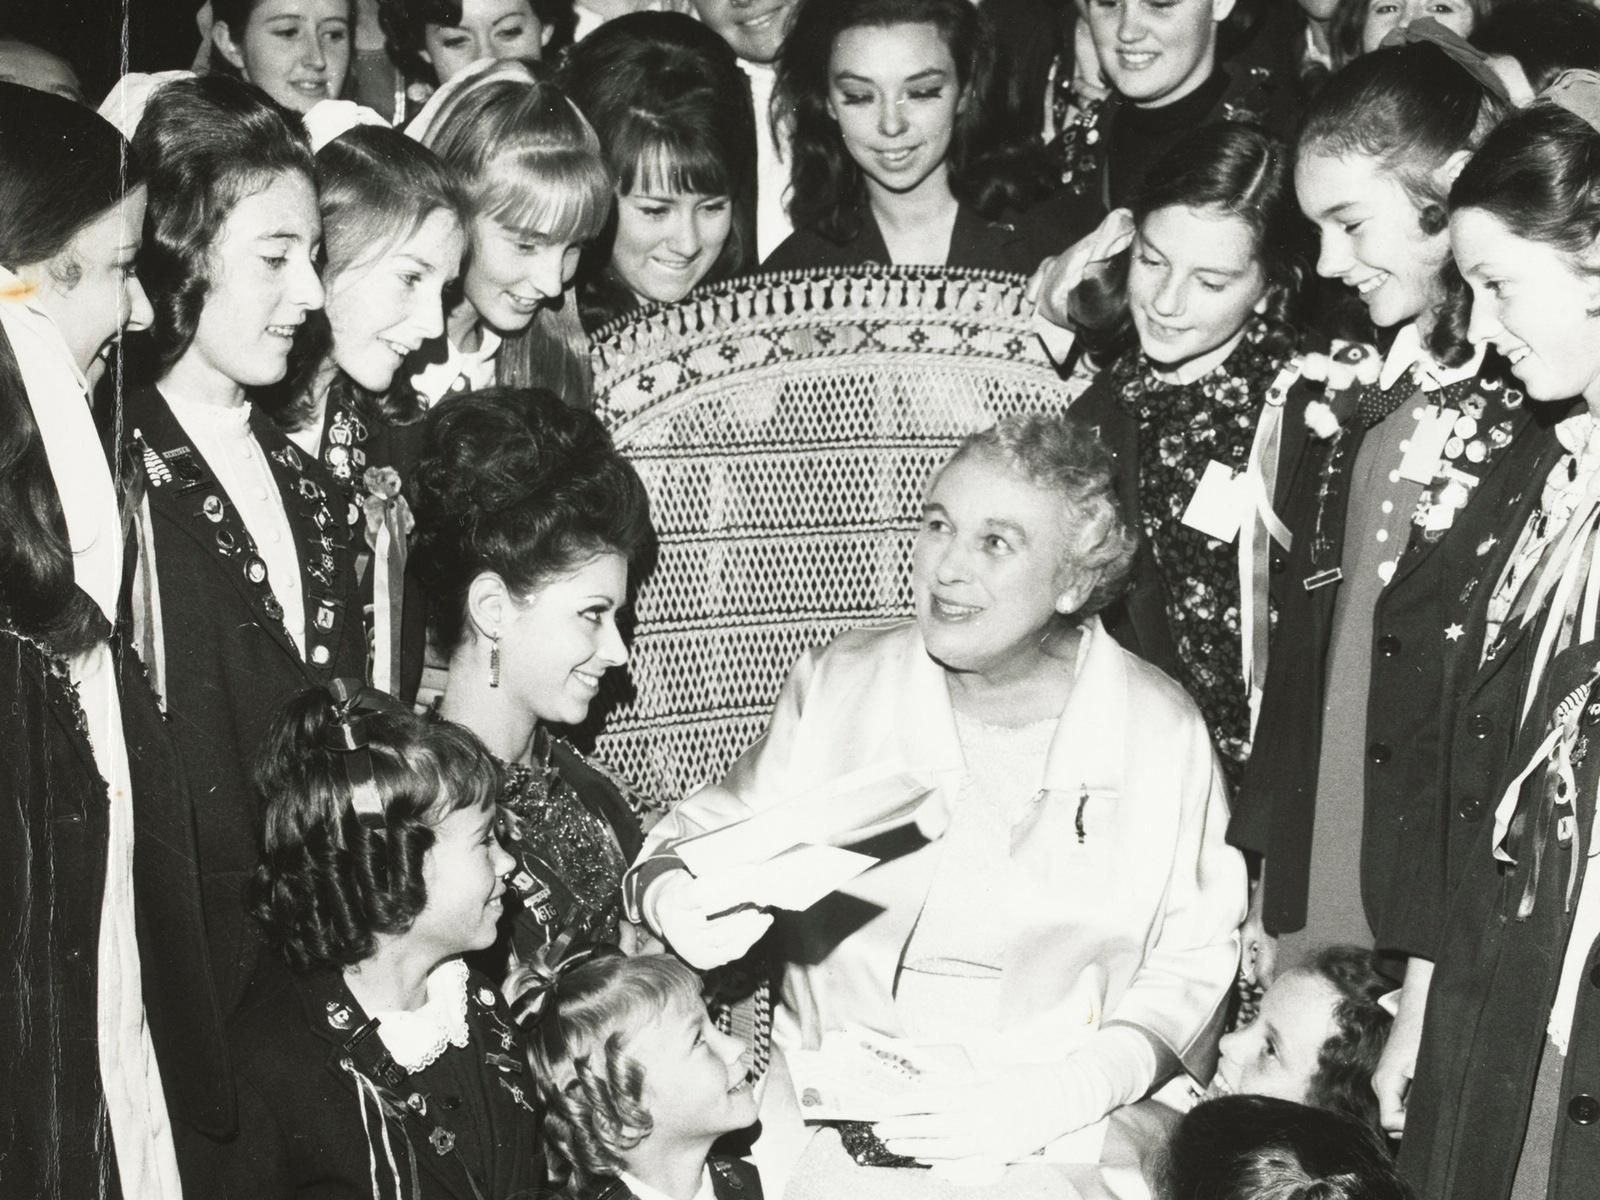 Miss Hopton's 50th-anniversary celebration, silver gelatin photograph, 1965, Vera E Hopton Papers